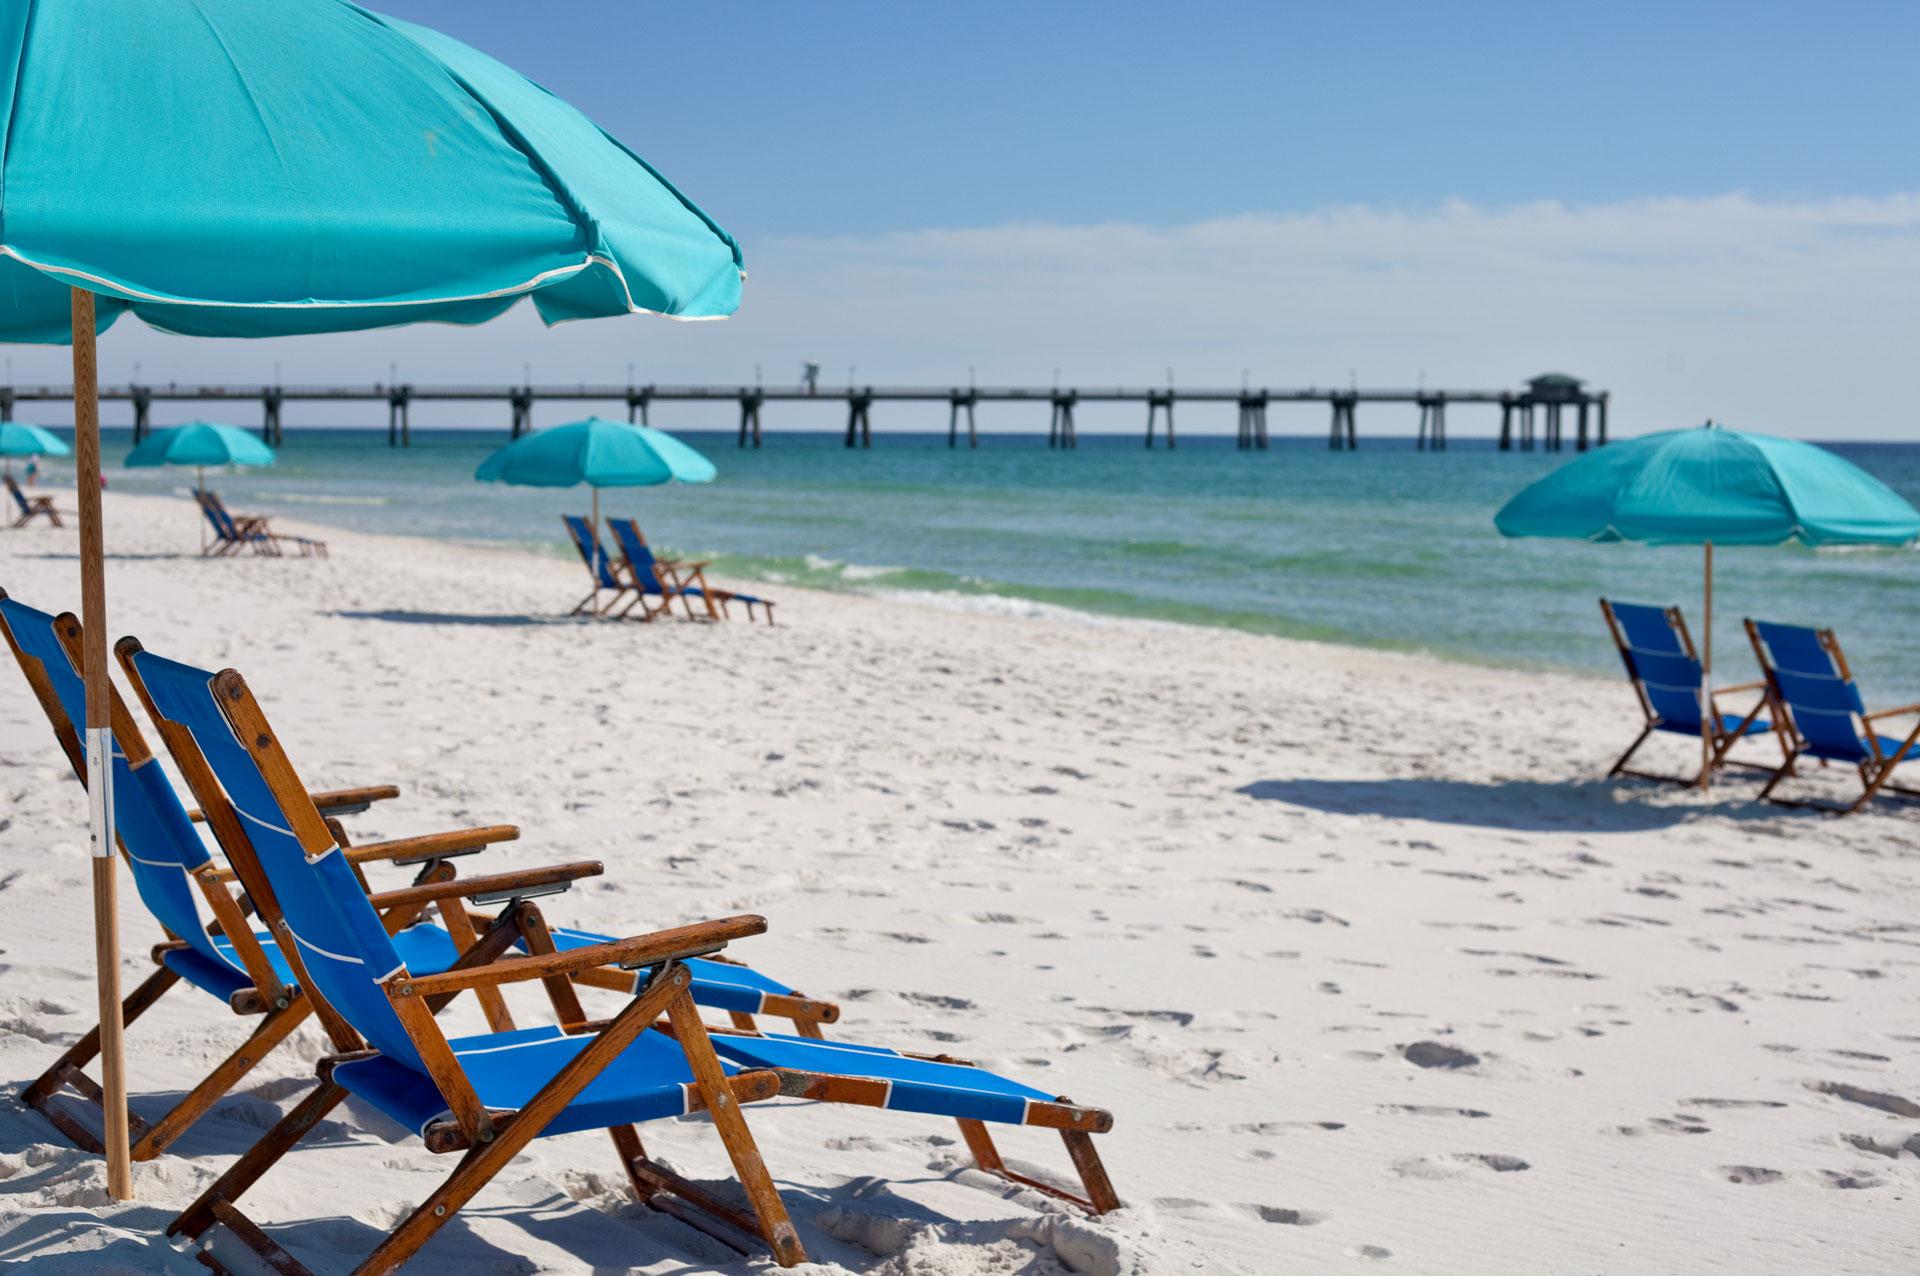 Lazy Days Beach Rentals Beach chairs and umbrellas rentals in a